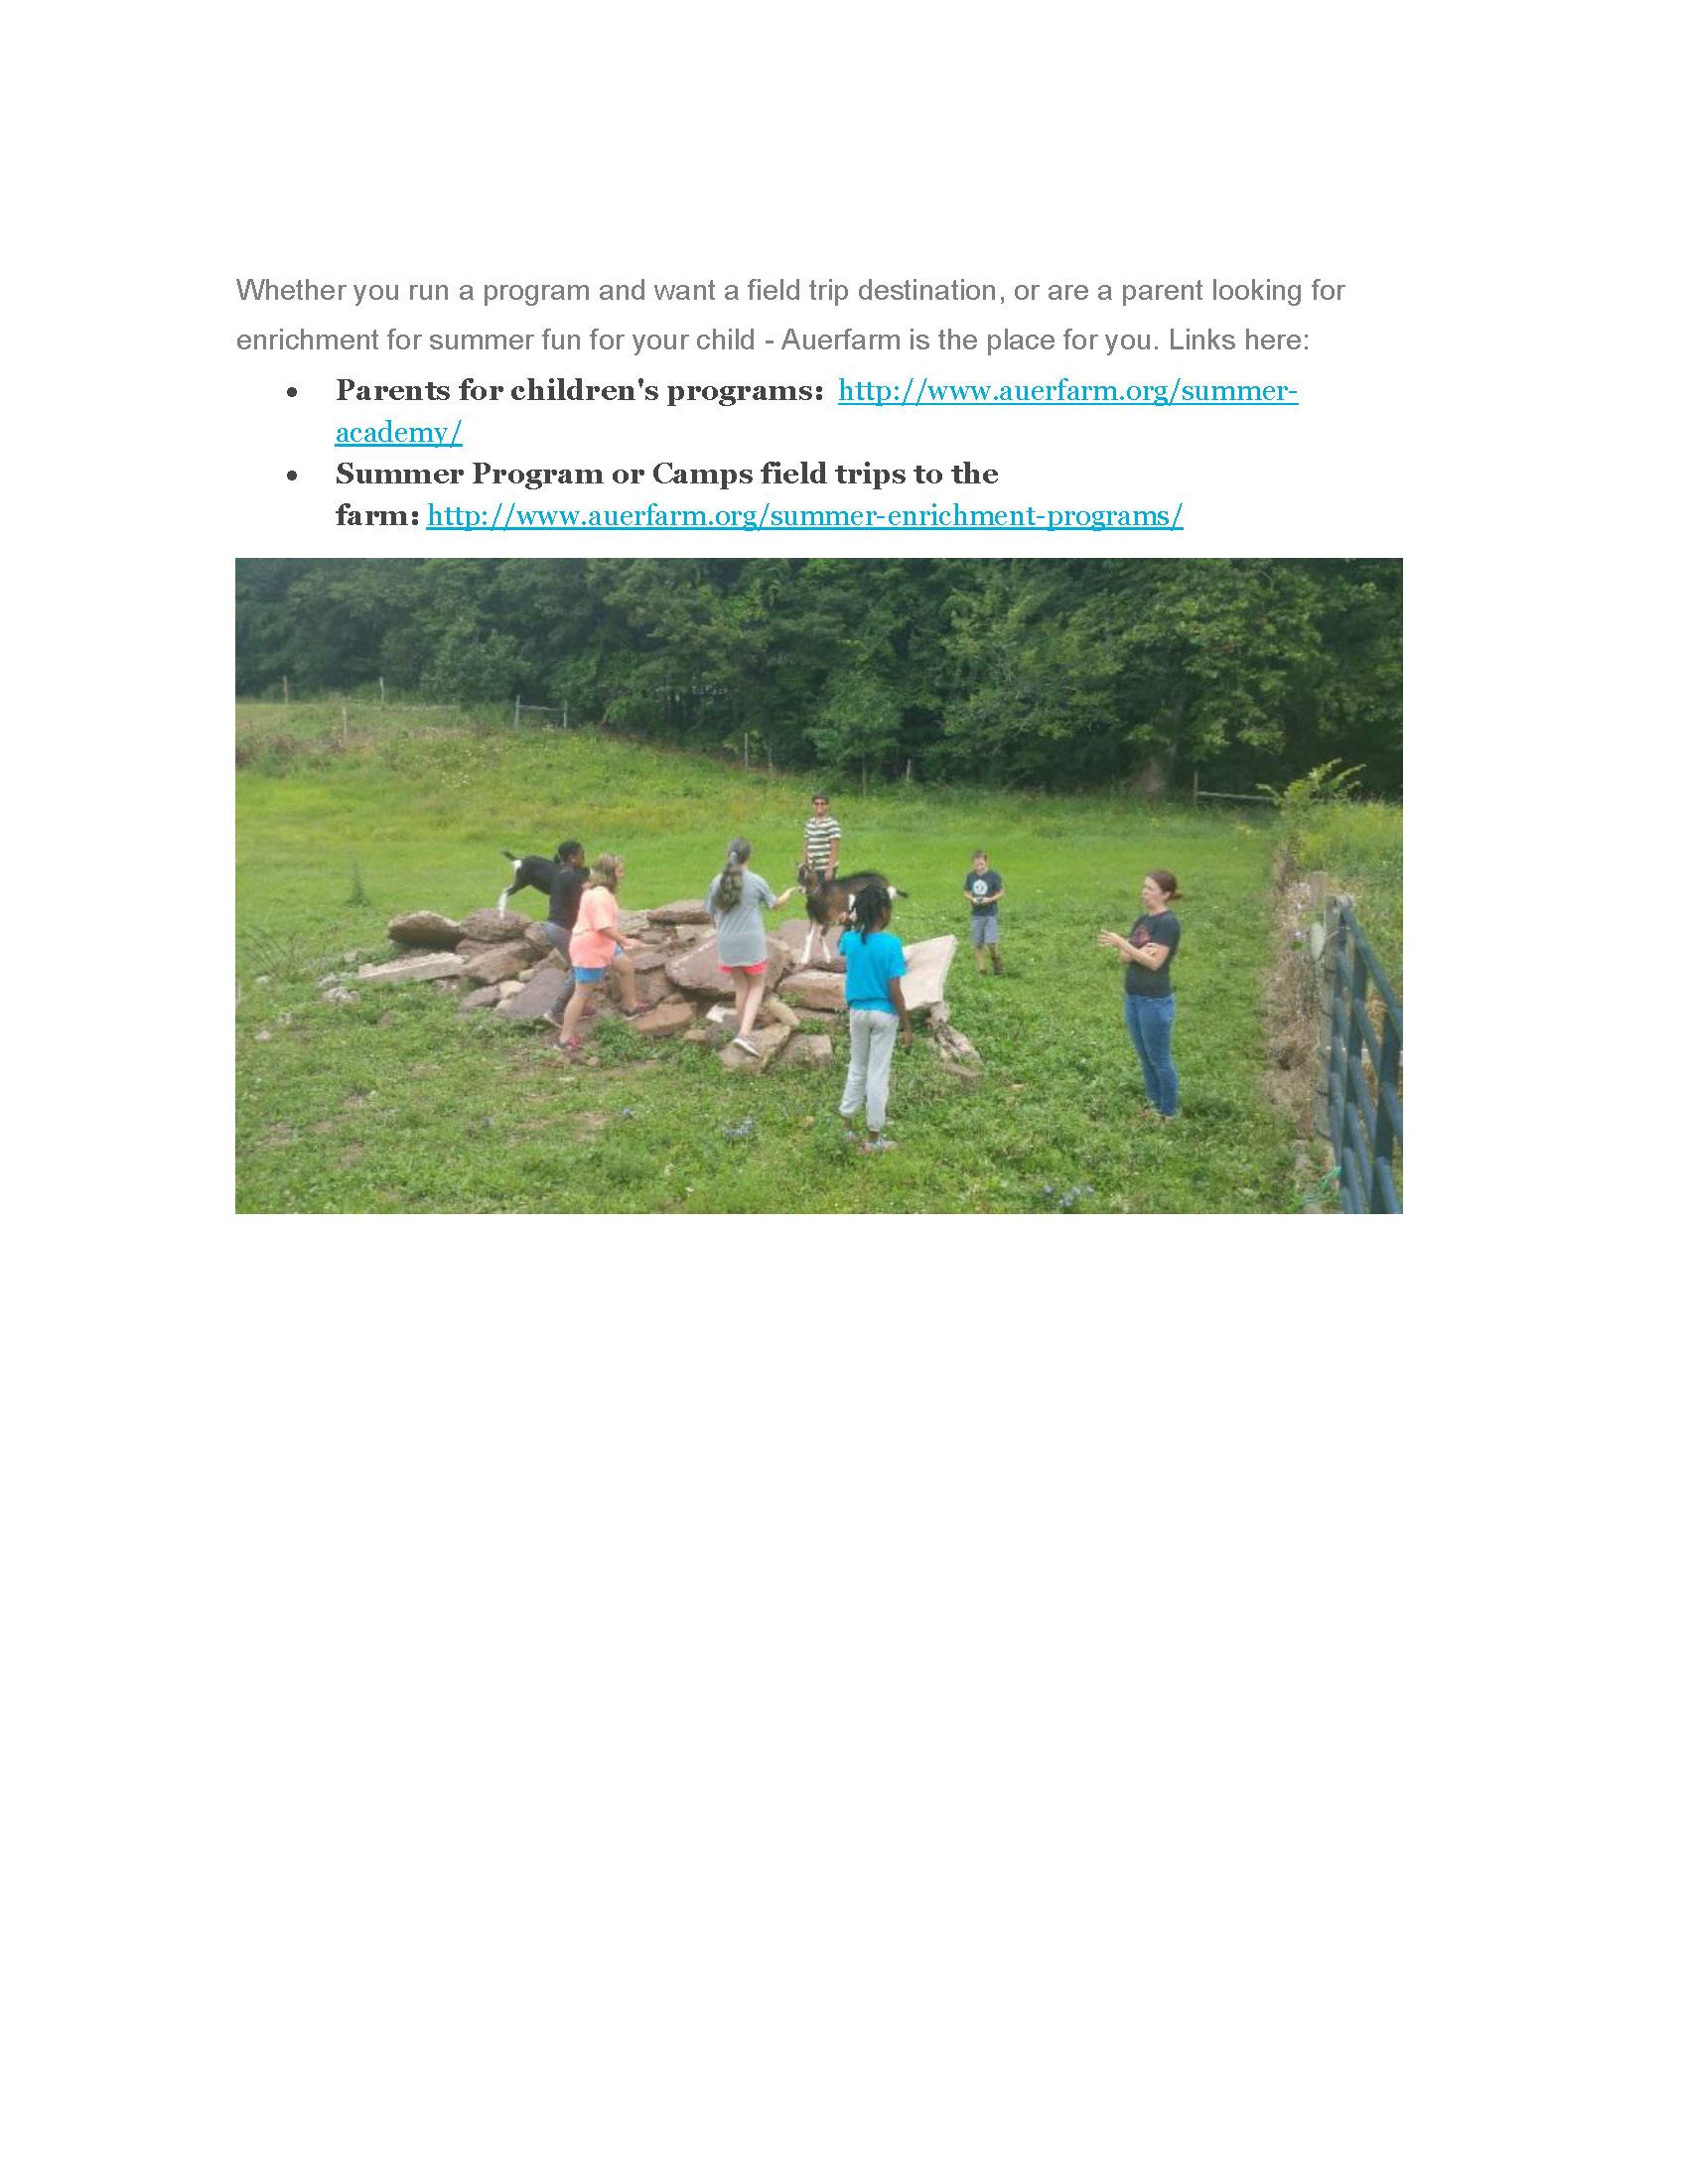 The Auerfarm News_Page_6.jpg